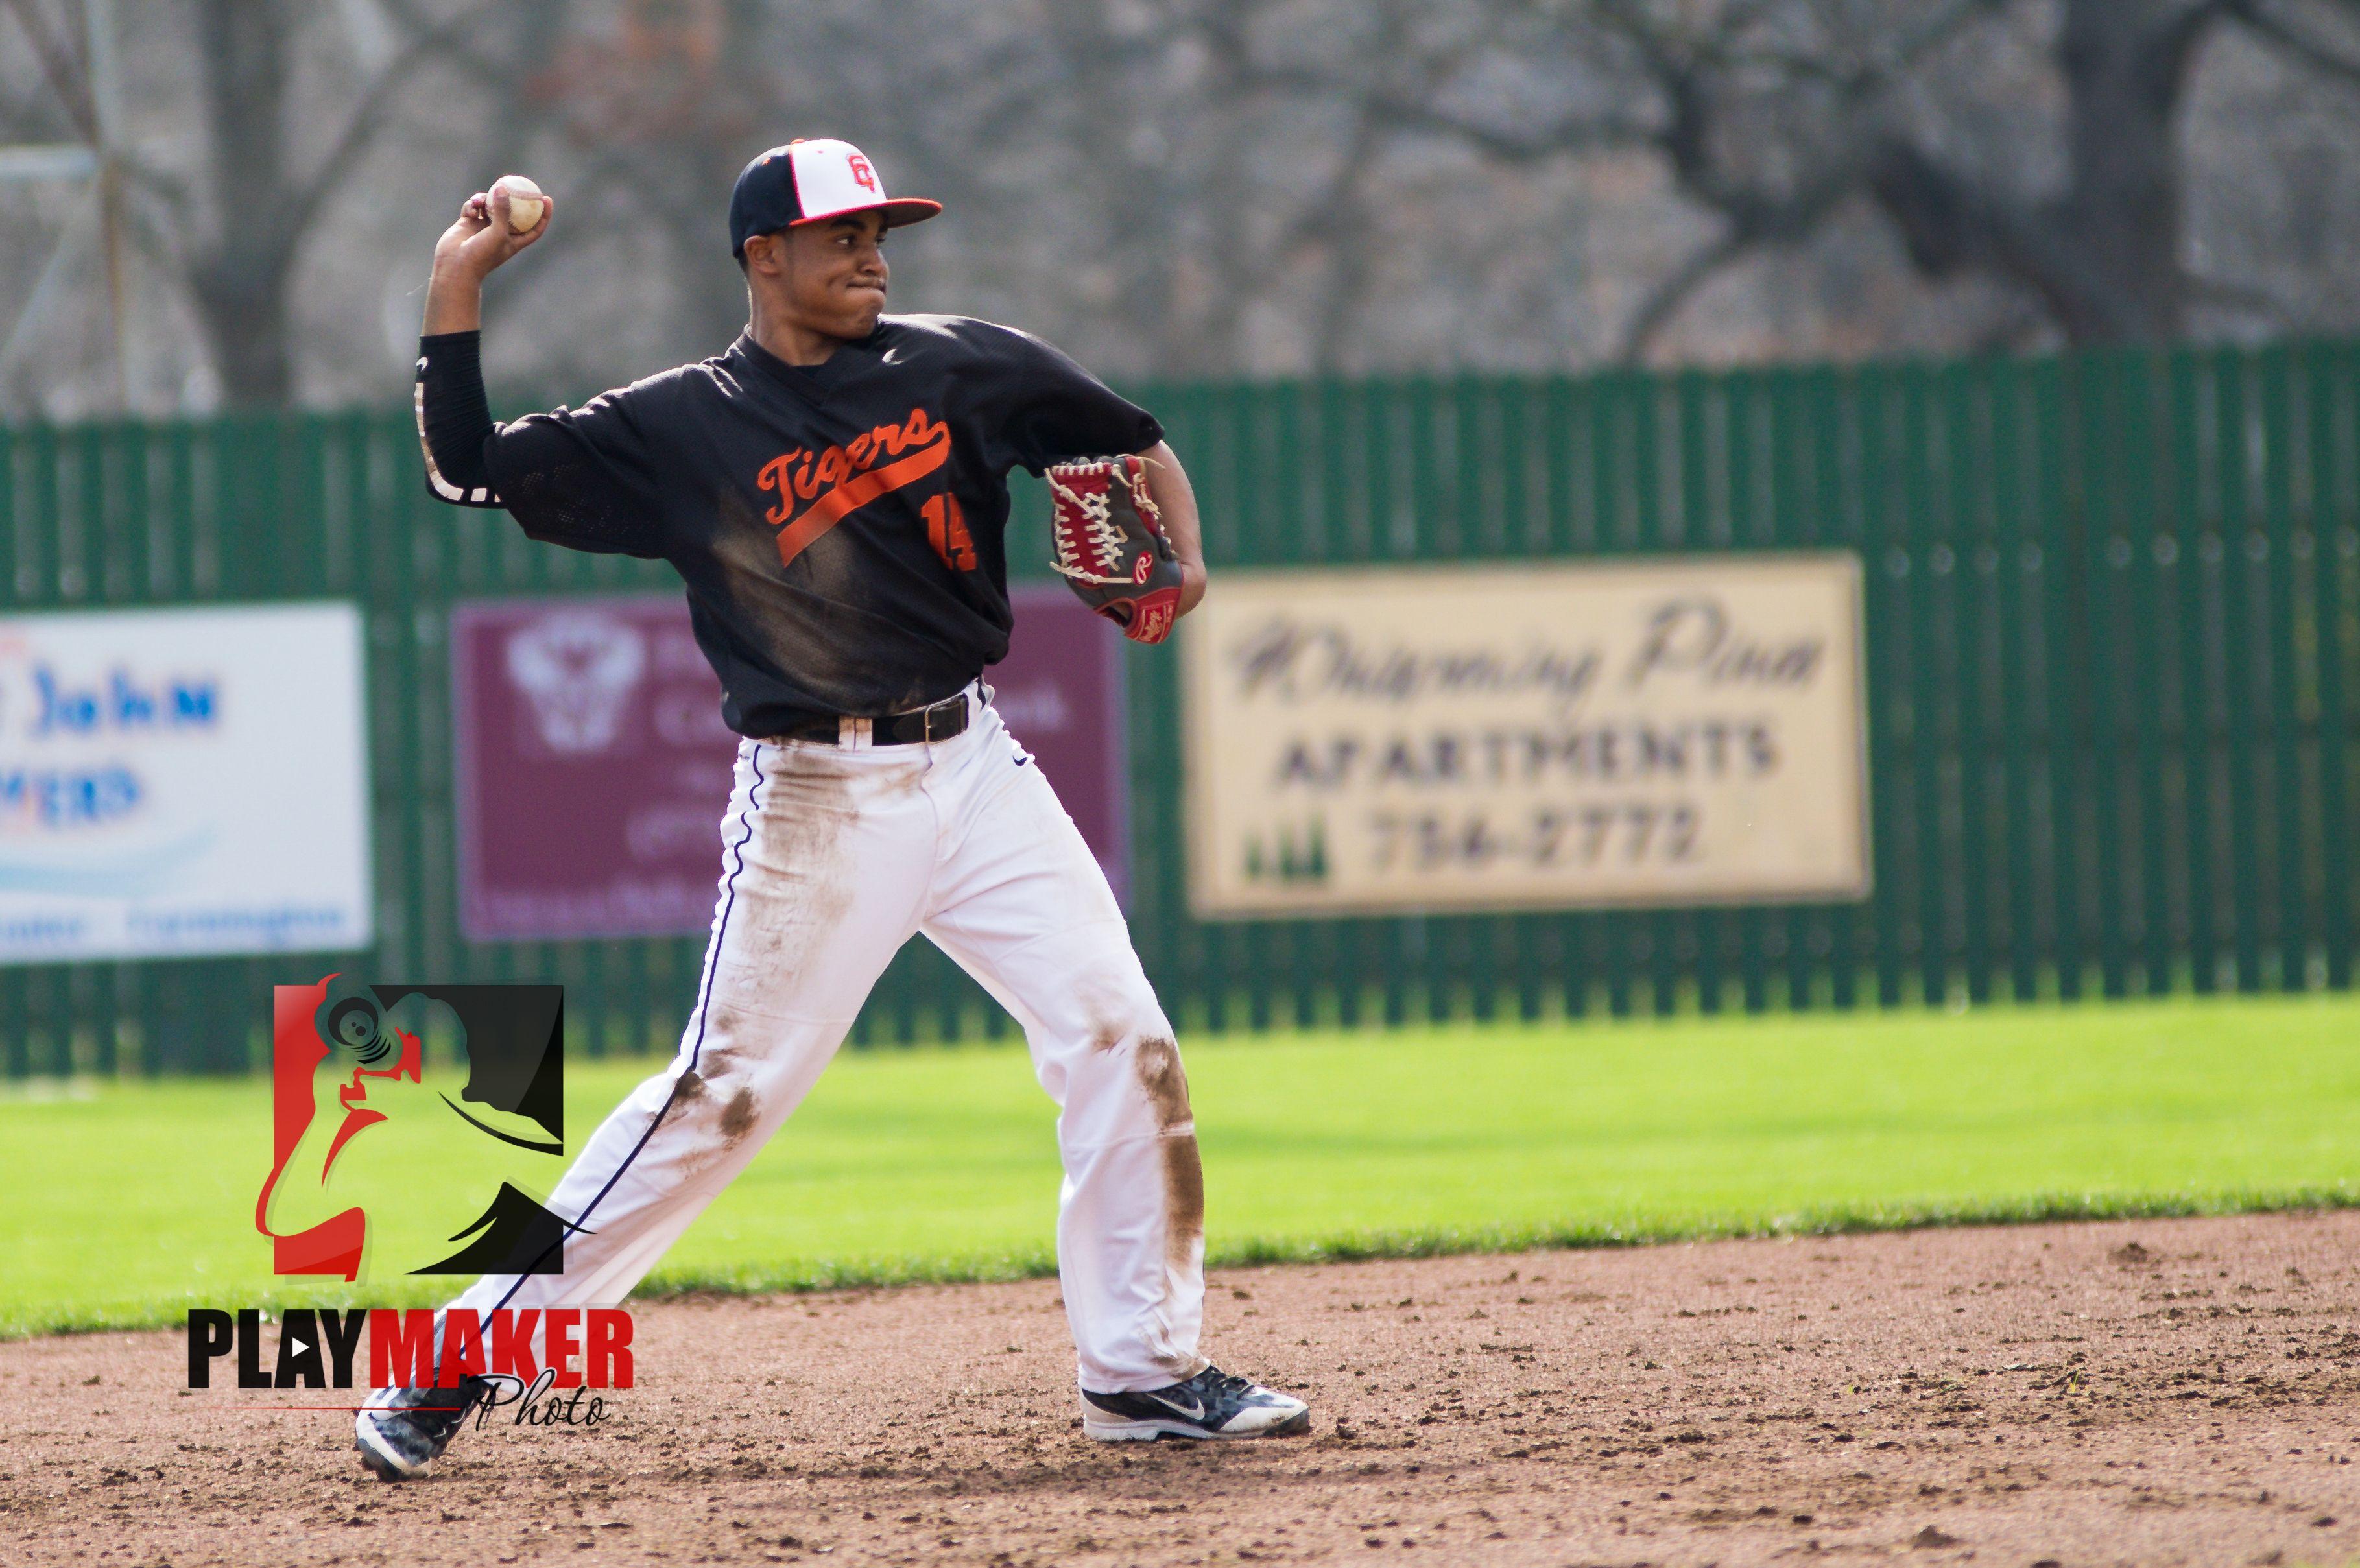 2015 03 25 Cape Central High School Freshman Baseball Sportsphotography Highschoolbaseball High School Baseball Highschool Freshman Cape Girardeau Missouri